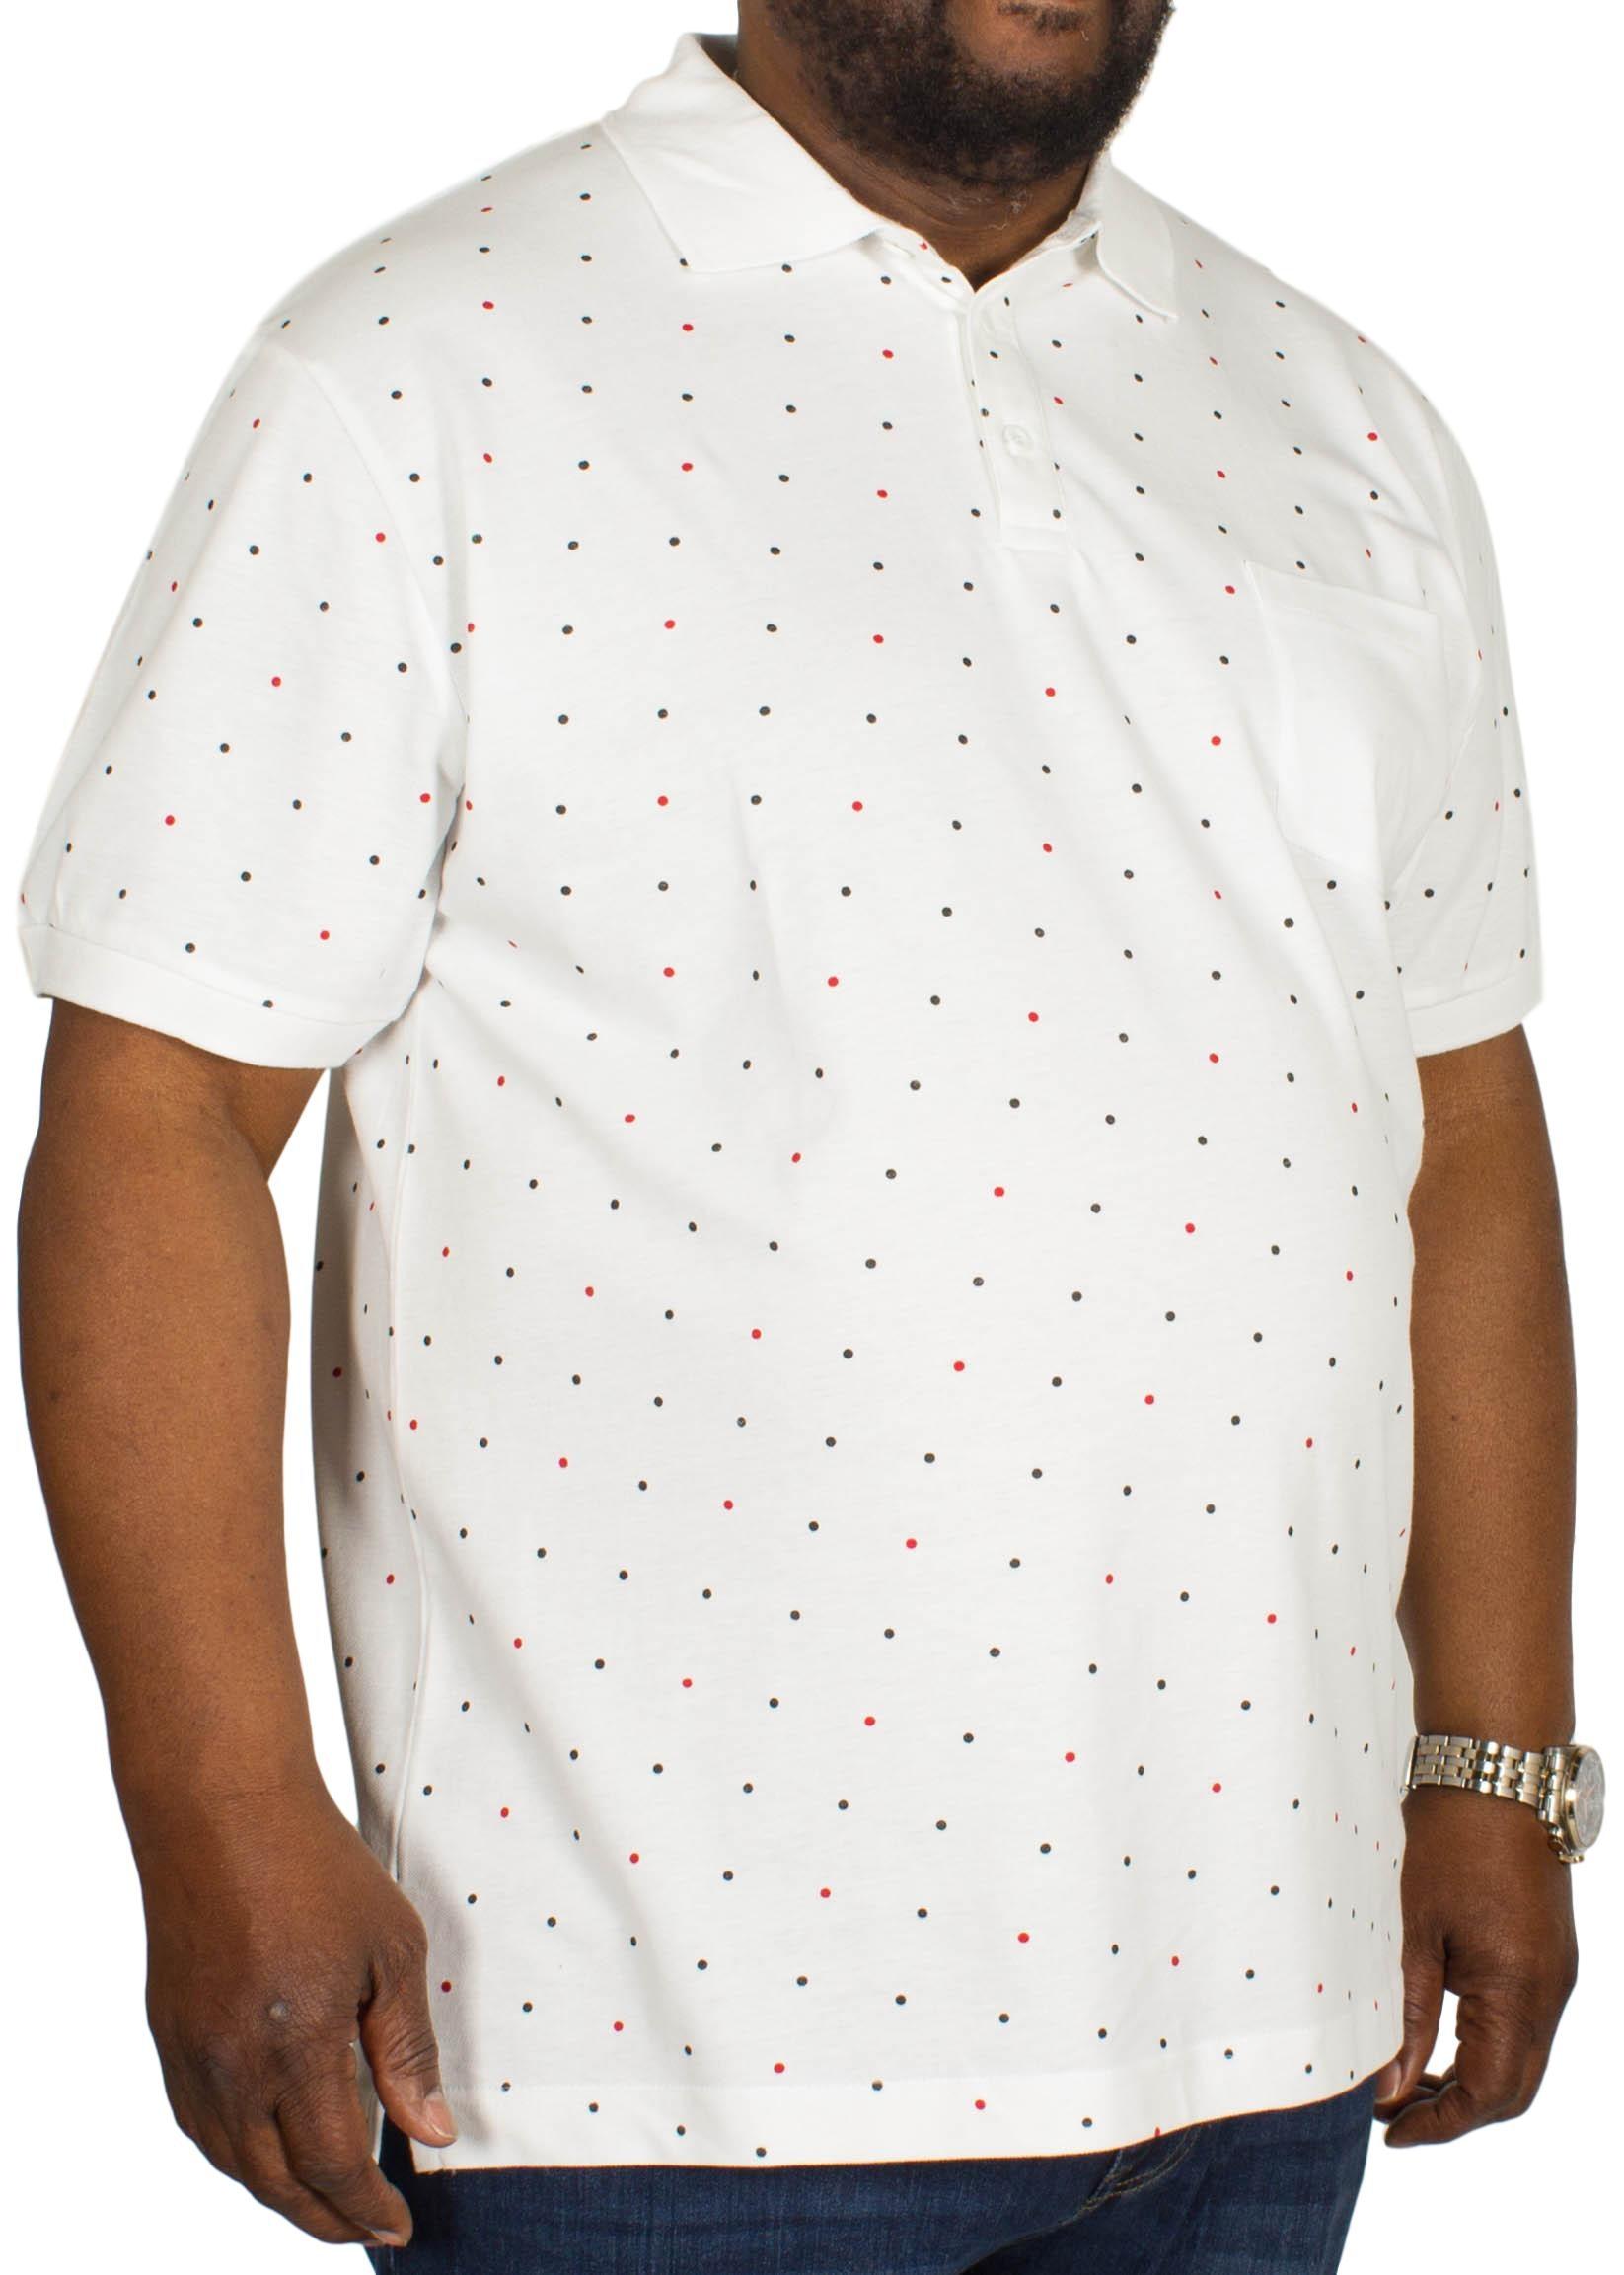 Bigdude Dotted Polo Shirt White